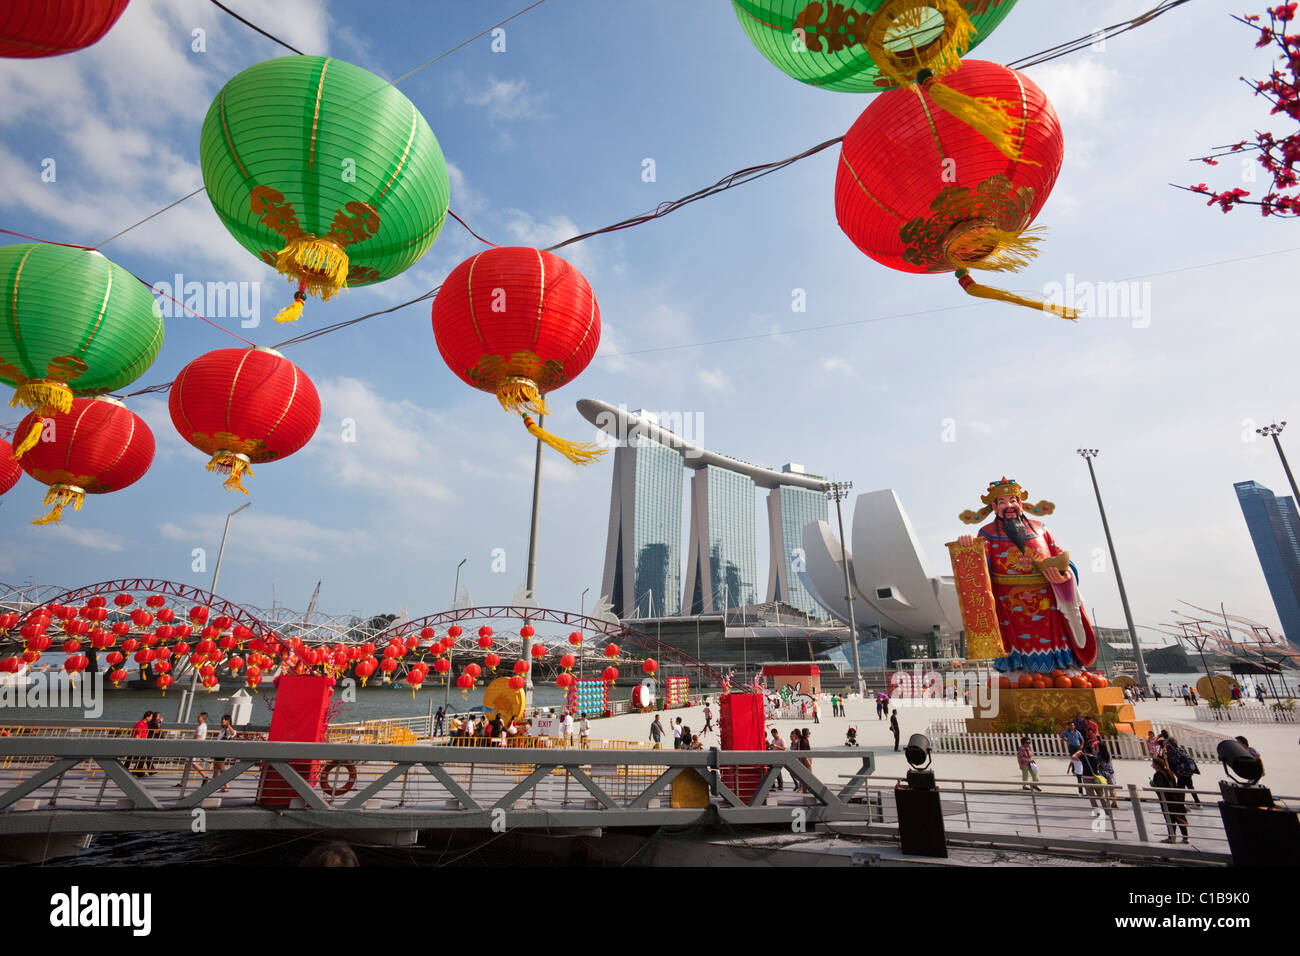 River Hongbao decorations (for Chinese New Year) and the Marina Bay Sands Hotel.  Marina Bay, Singapore Stock Photo